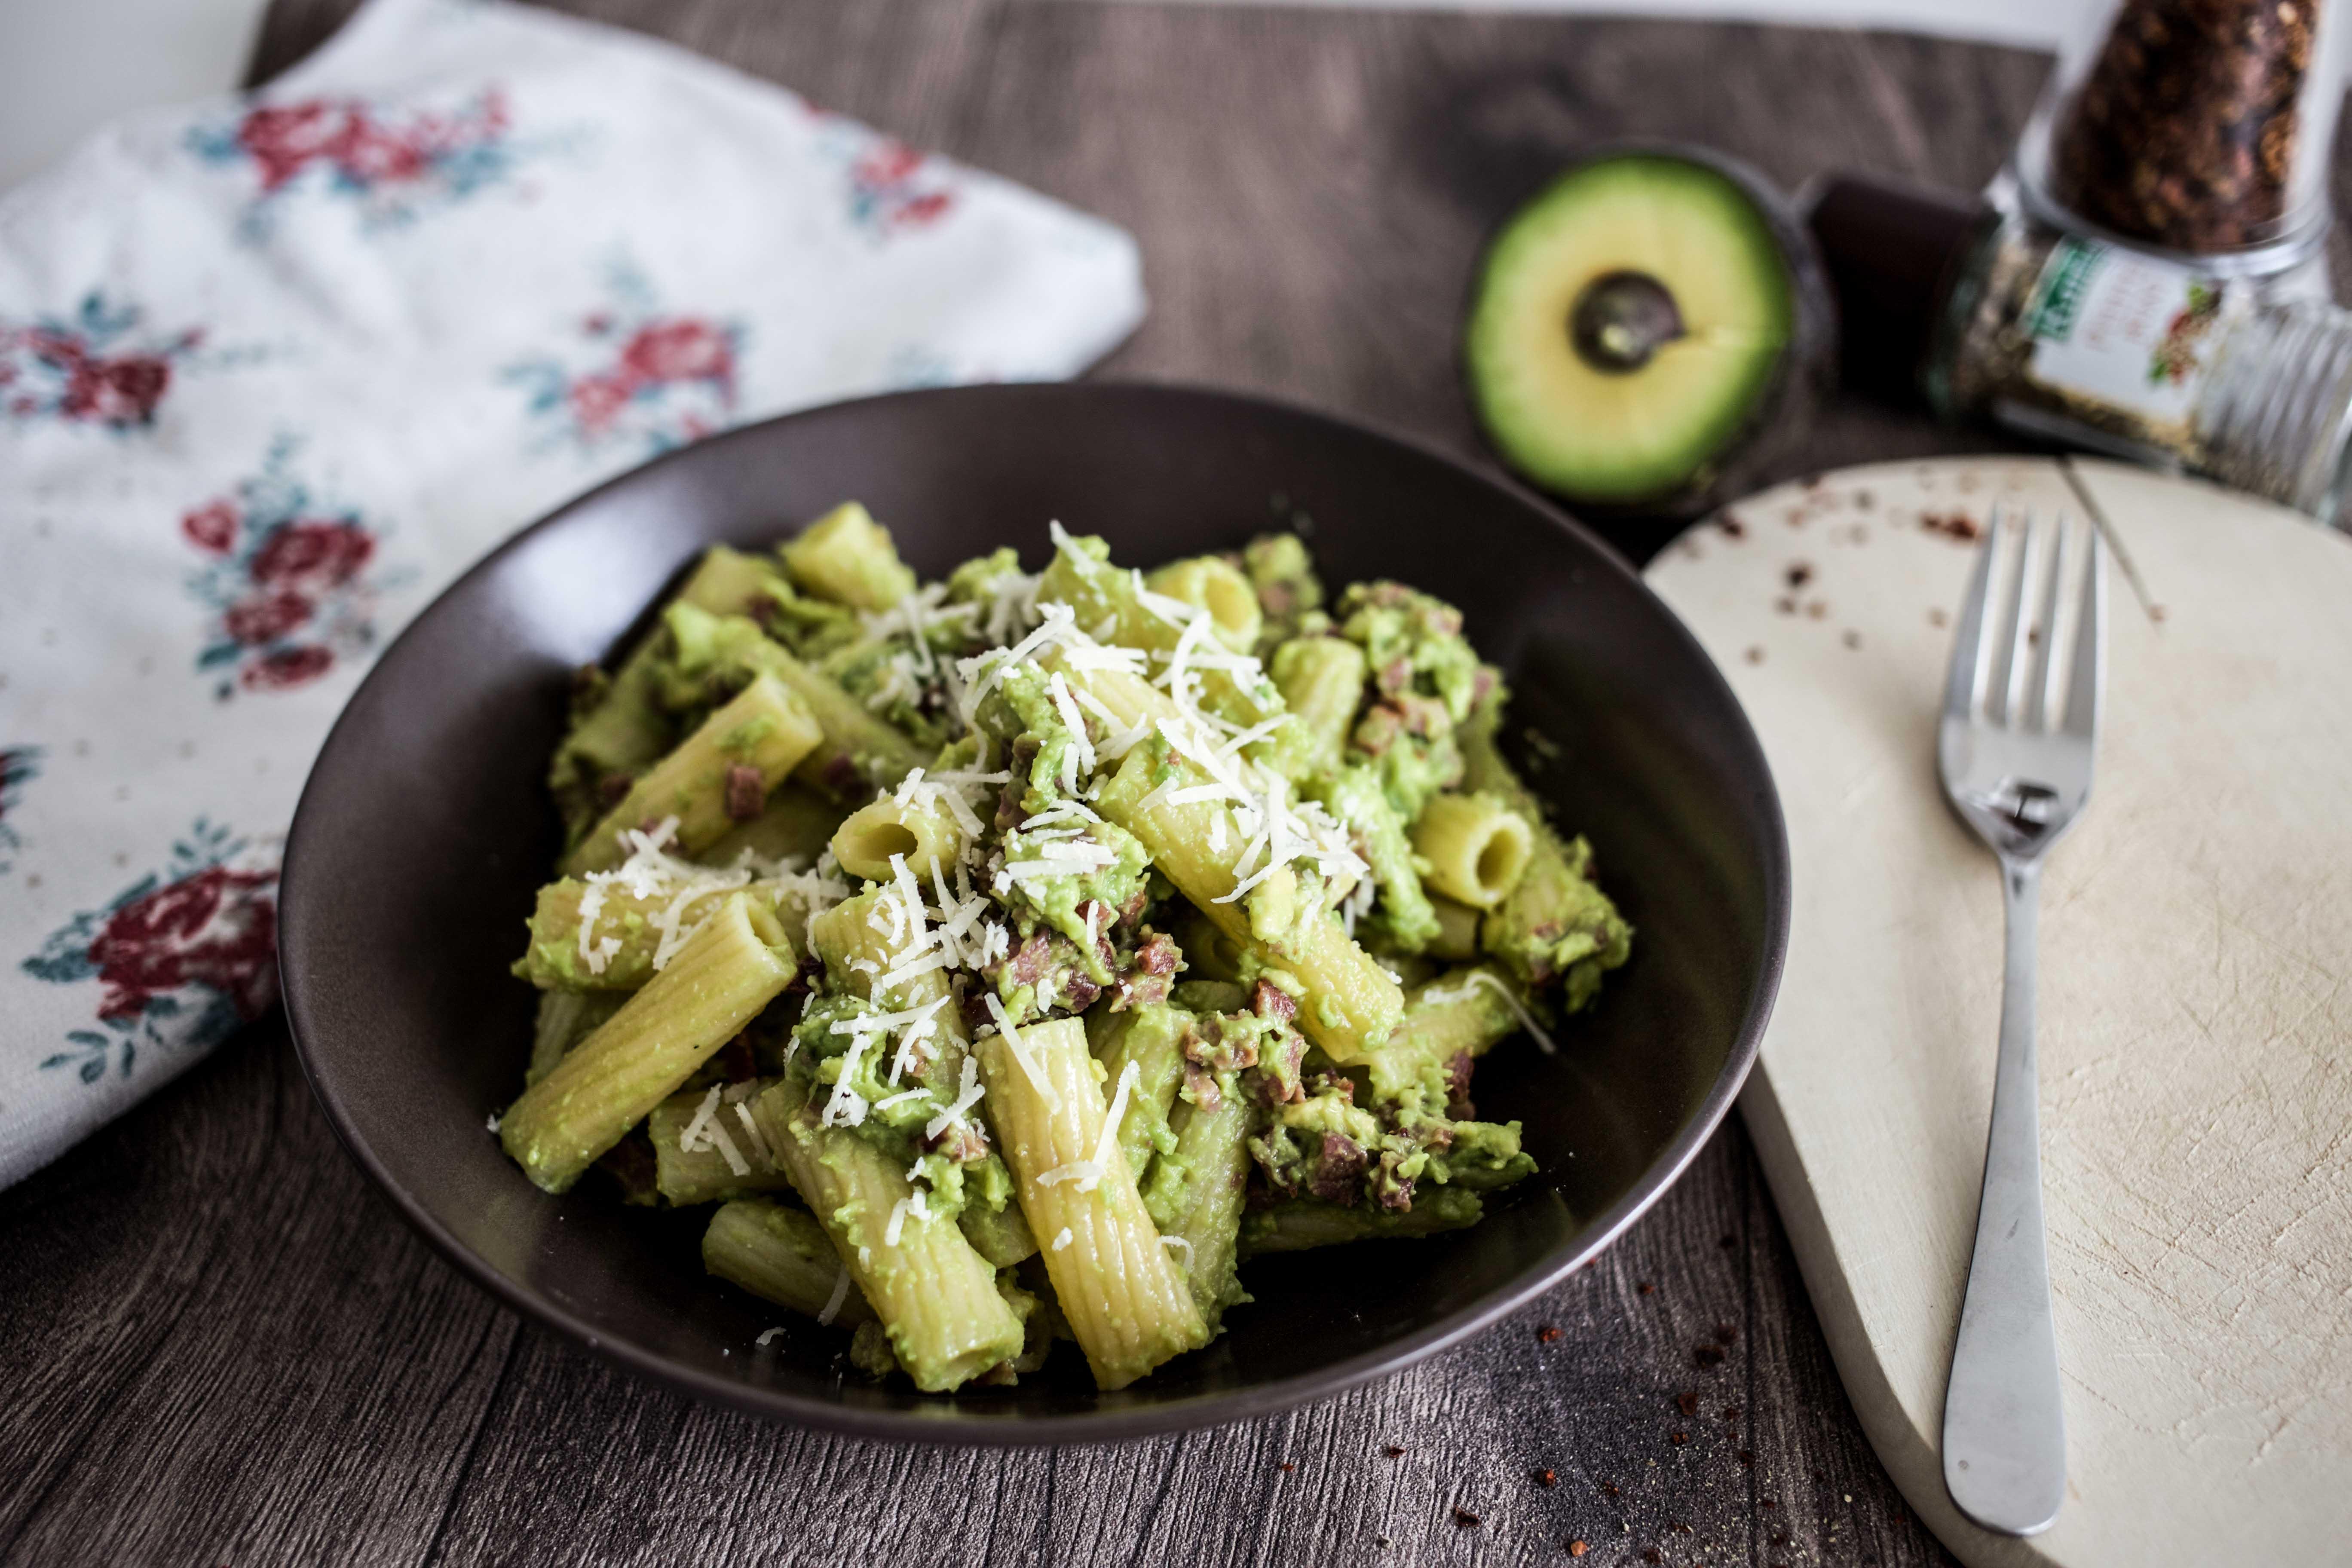 avocado carbonara rezept die trend frucht mit pasta. Black Bedroom Furniture Sets. Home Design Ideas